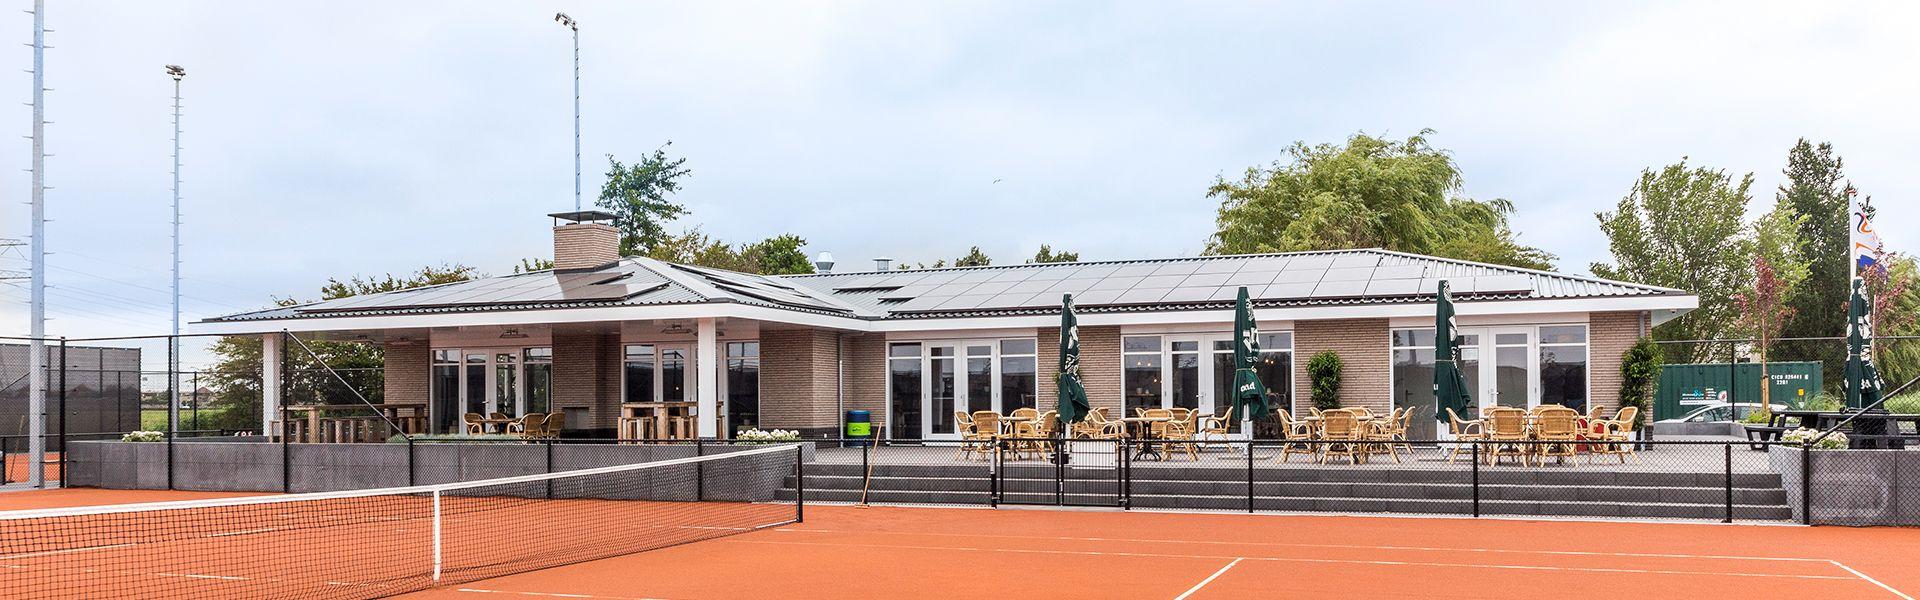 Sassenheimse Tennisvereniging